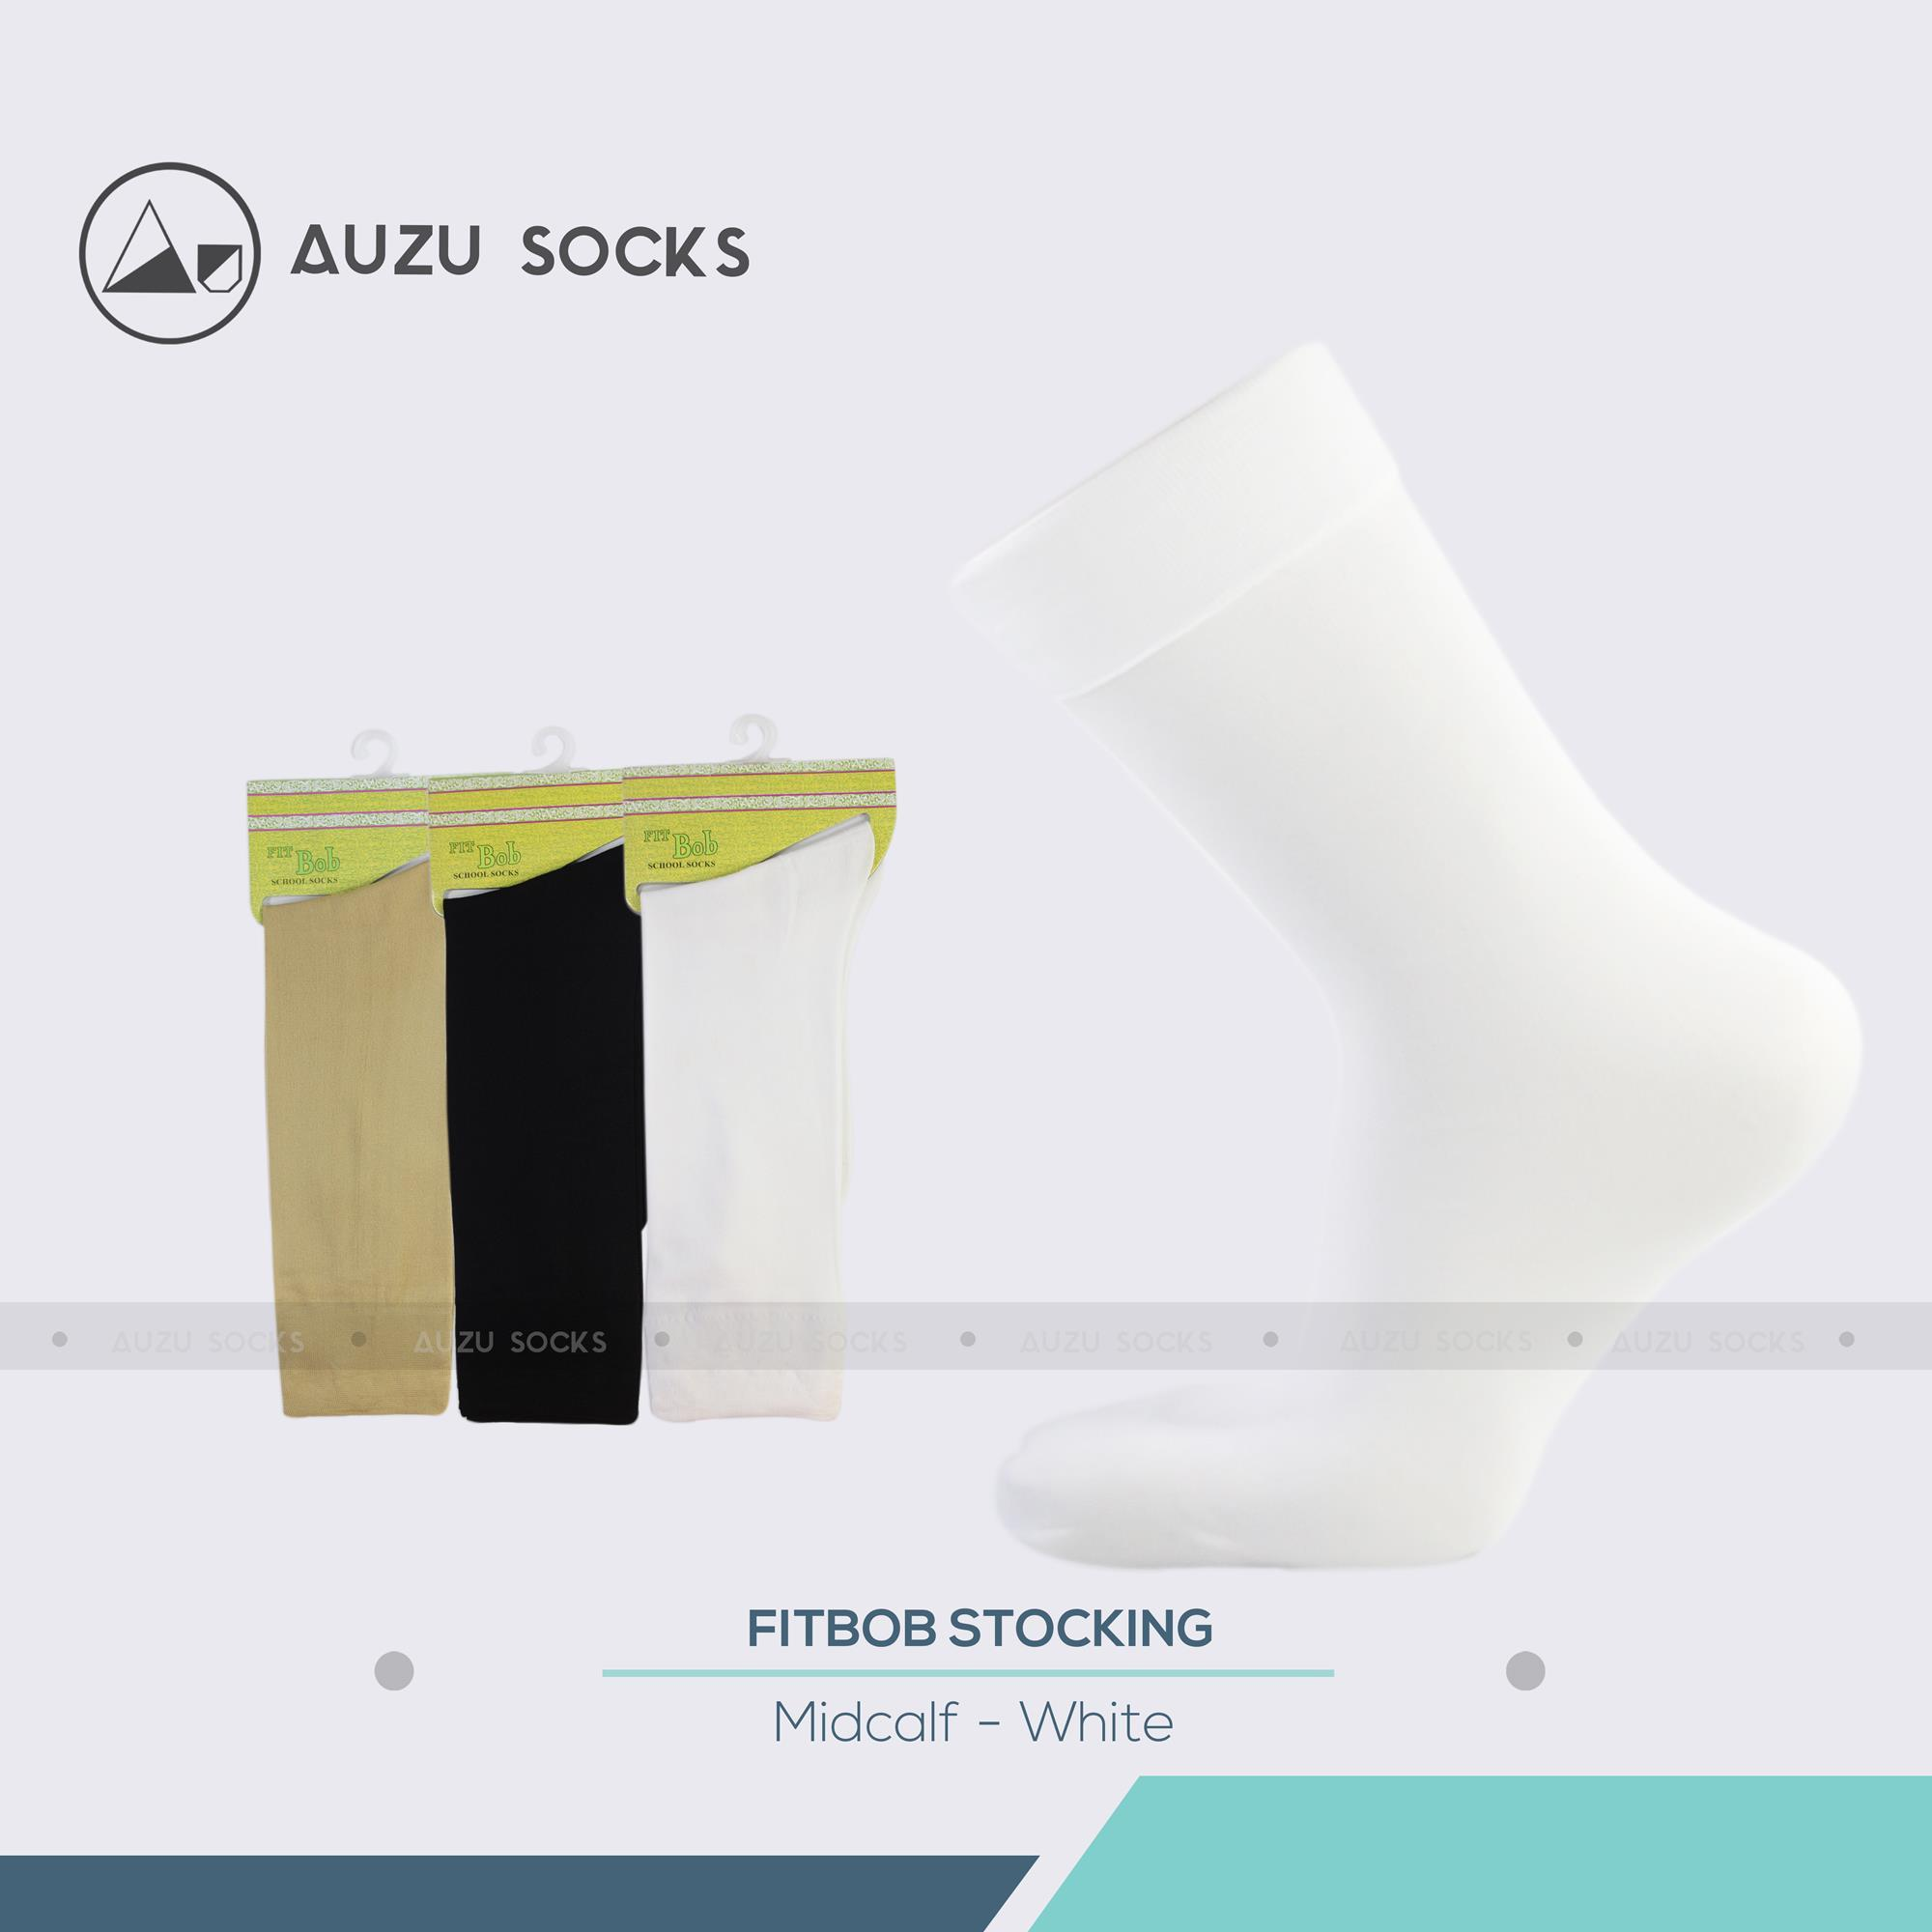 Buy Sell Cheapest Auzu Kaos Kaki Best Quality Product Deals Pramuka Sma Socks 2 Pasang Formal Wanita Kerja Stocking Sebetis